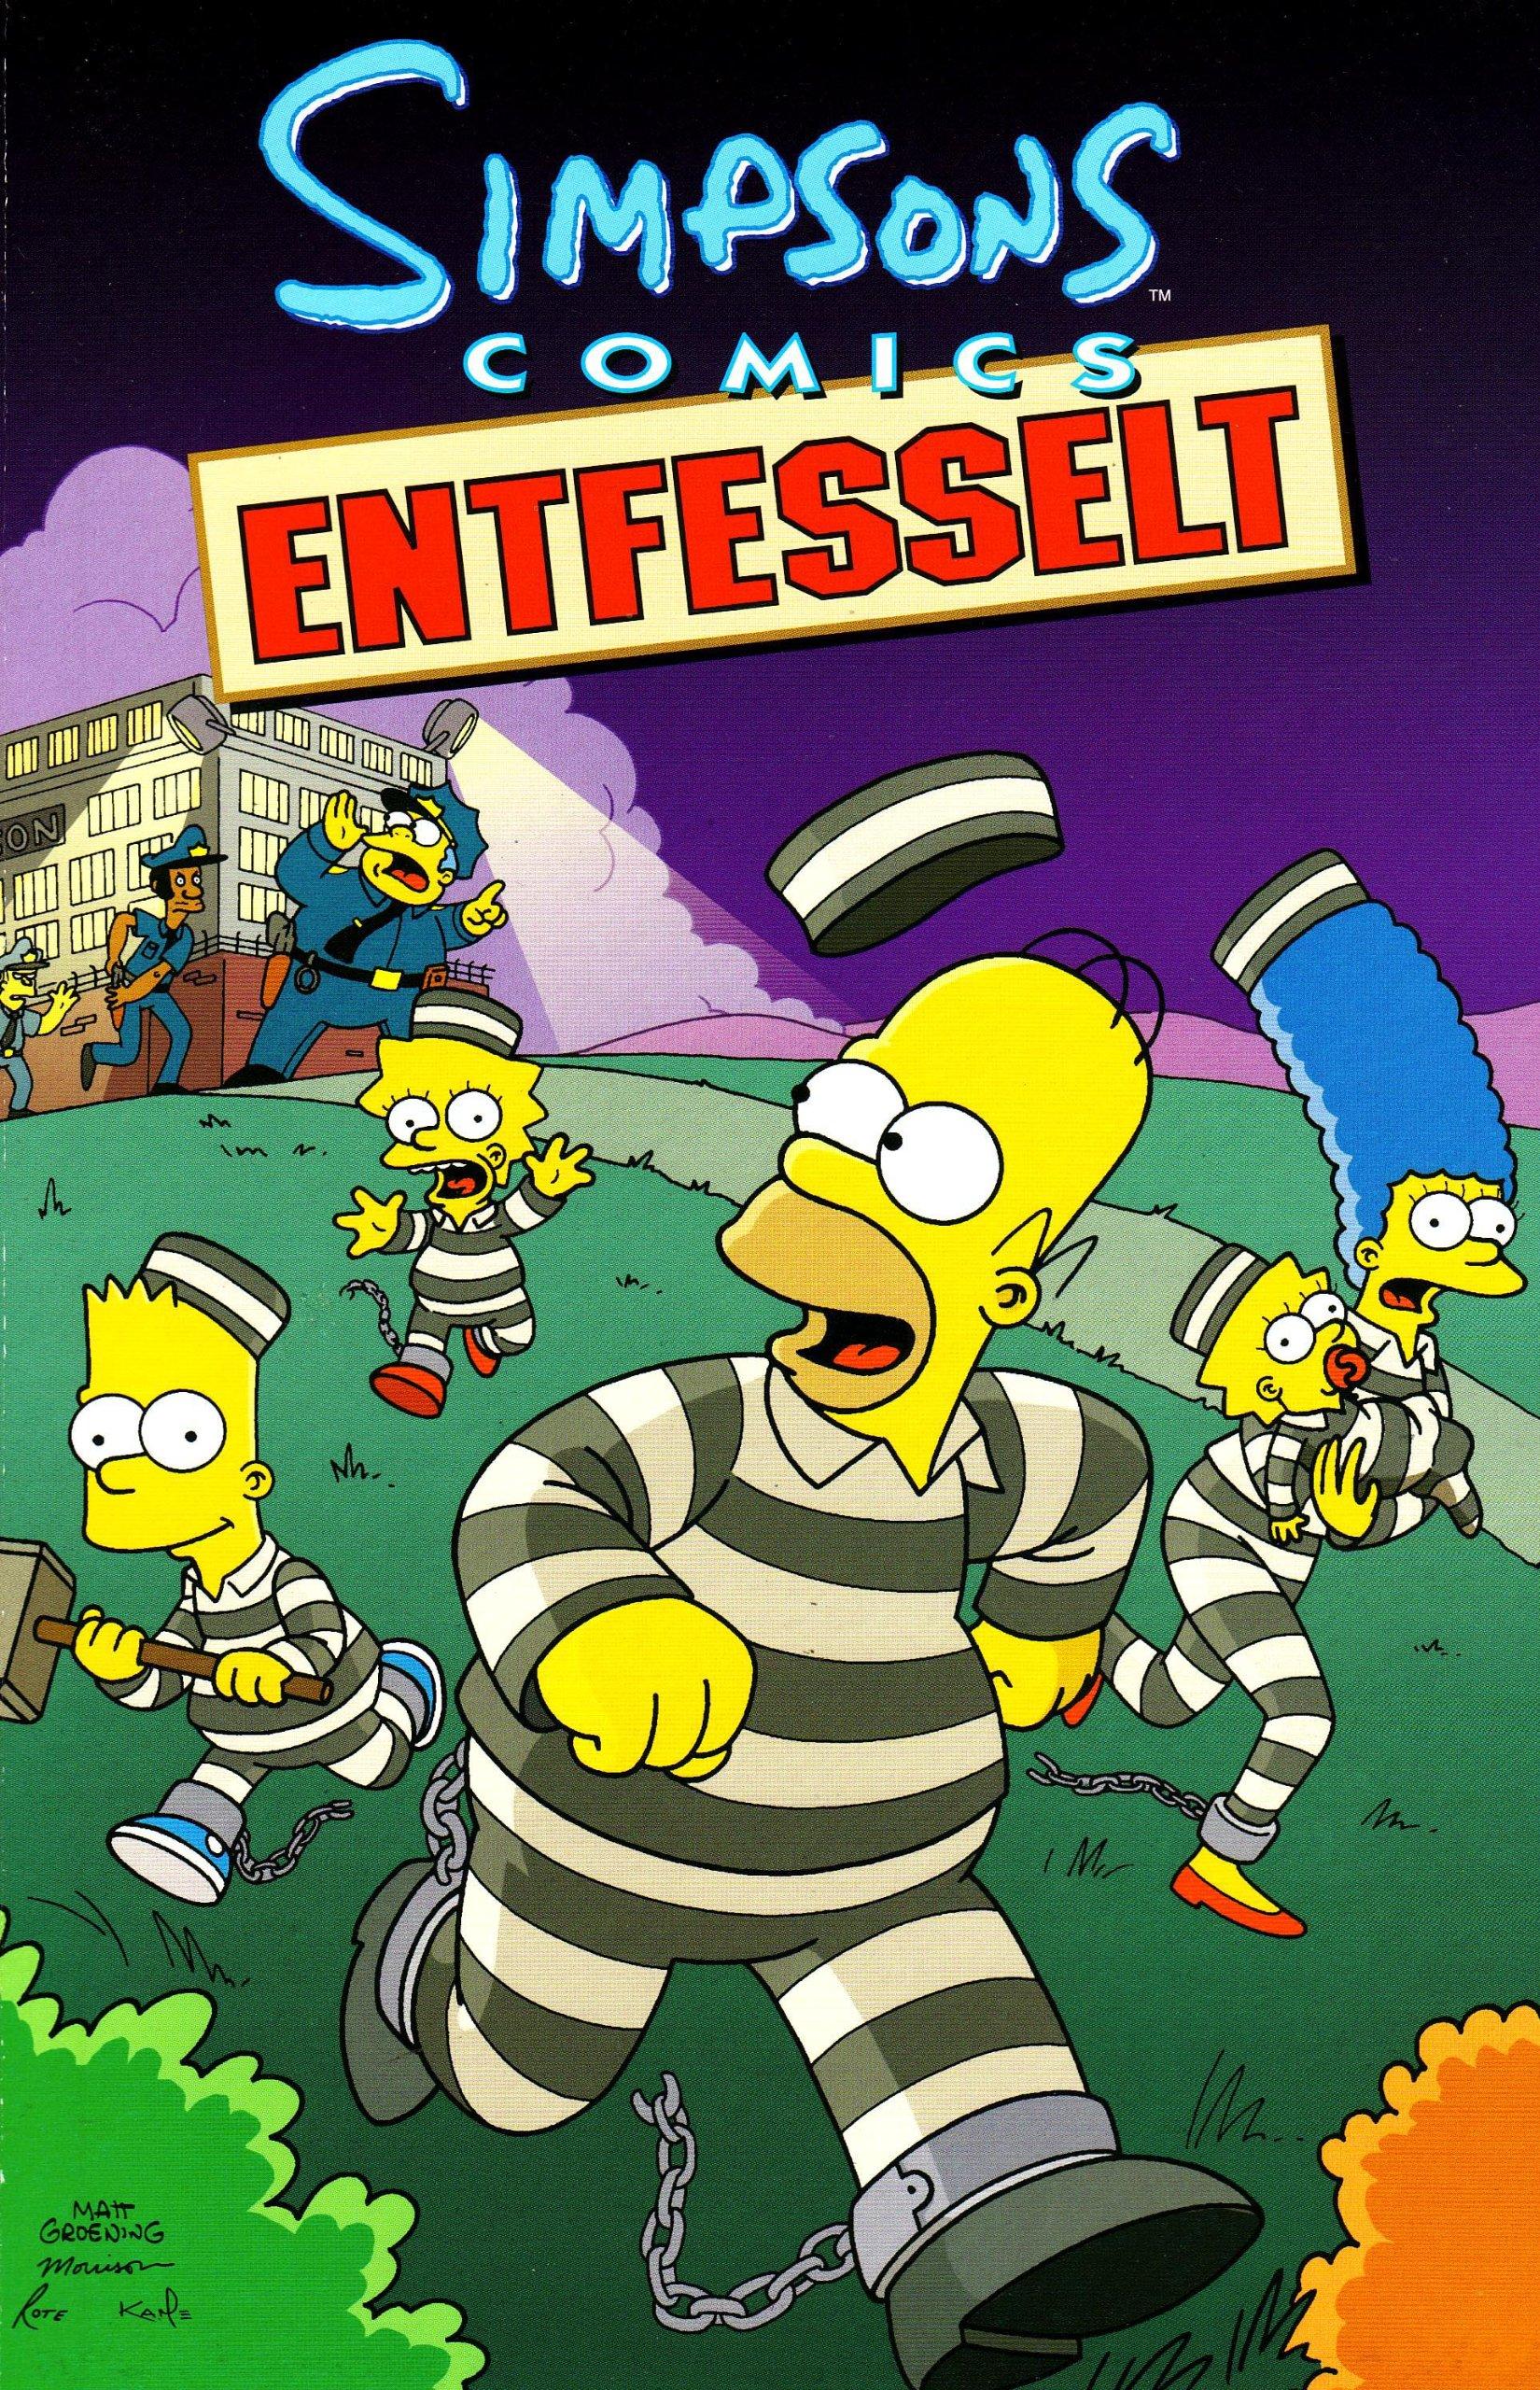 Simpsons Comics Sonderband 10. Entfesselt Broschiert – 21. November 2009 Matt Groening Bill Morrison Panini 3866077297